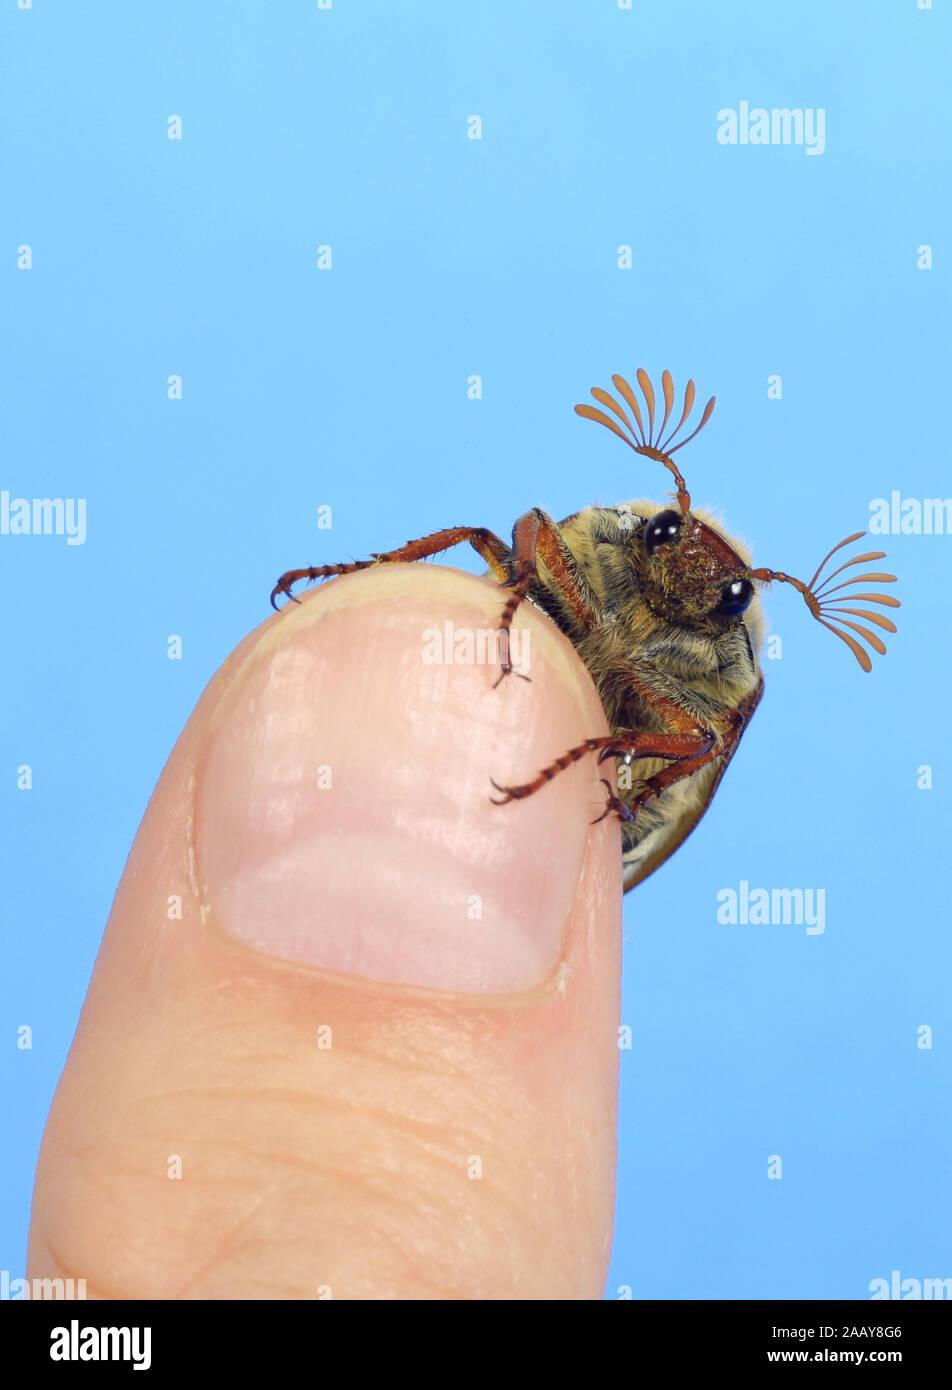 Maikaefer, Feldmaikaefer (Melolontha melolontha), auf einem Finger, Deutschland   common cockchafer, maybug (Melolontha melolontha), on a finger, Germ Stock Photo